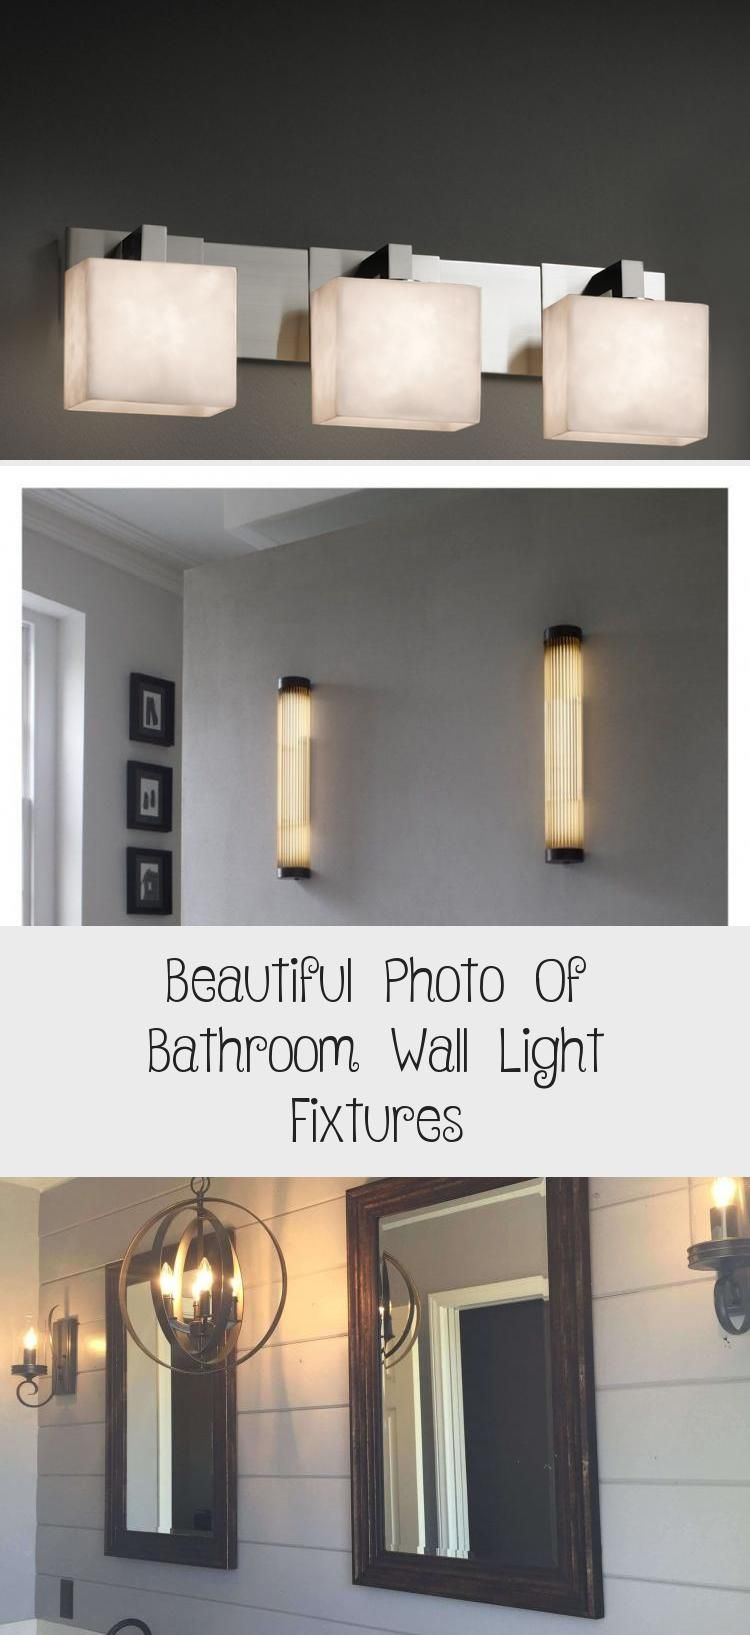 Beautiful Photo Of Bathroom Wall Light Fixtures Bathroom Wall Light Fixtures 0612659 3 Light Low Bathroom Wall Light Fixtures Bathroom Lighting Light Fixtures